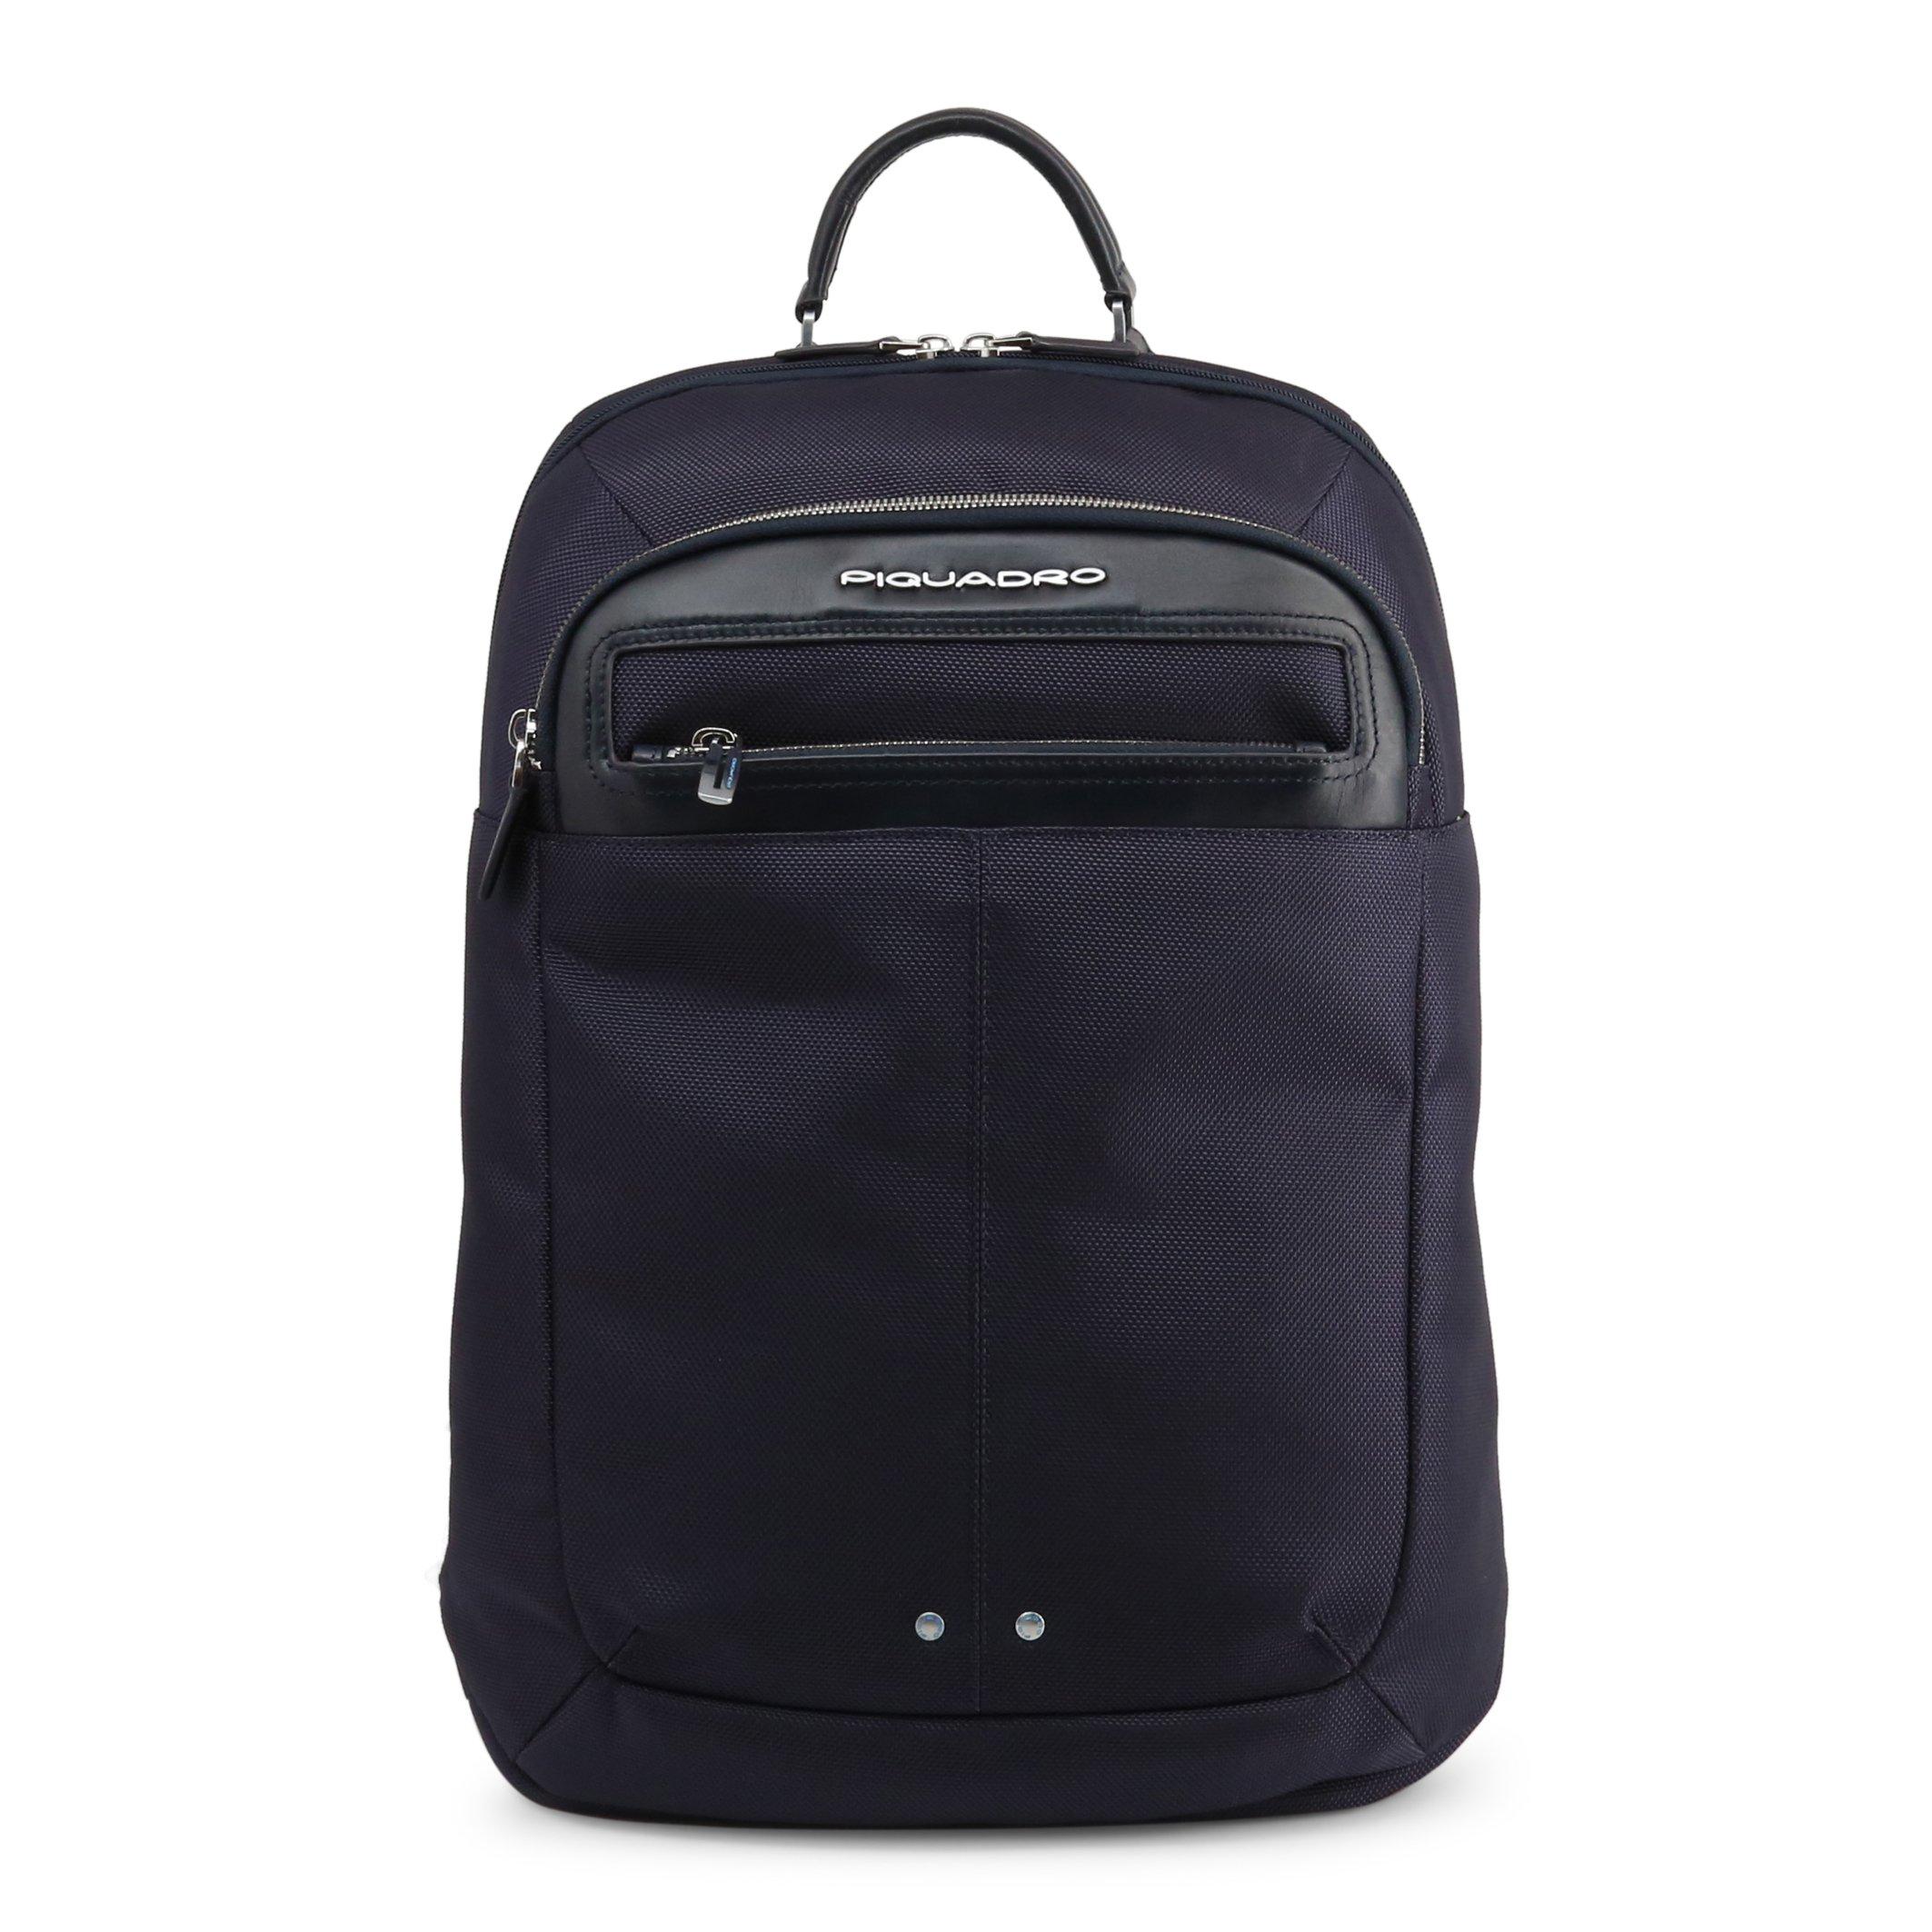 Piquadro Men's Backpack Various Colours CA3772LK2 - blue NOSIZE